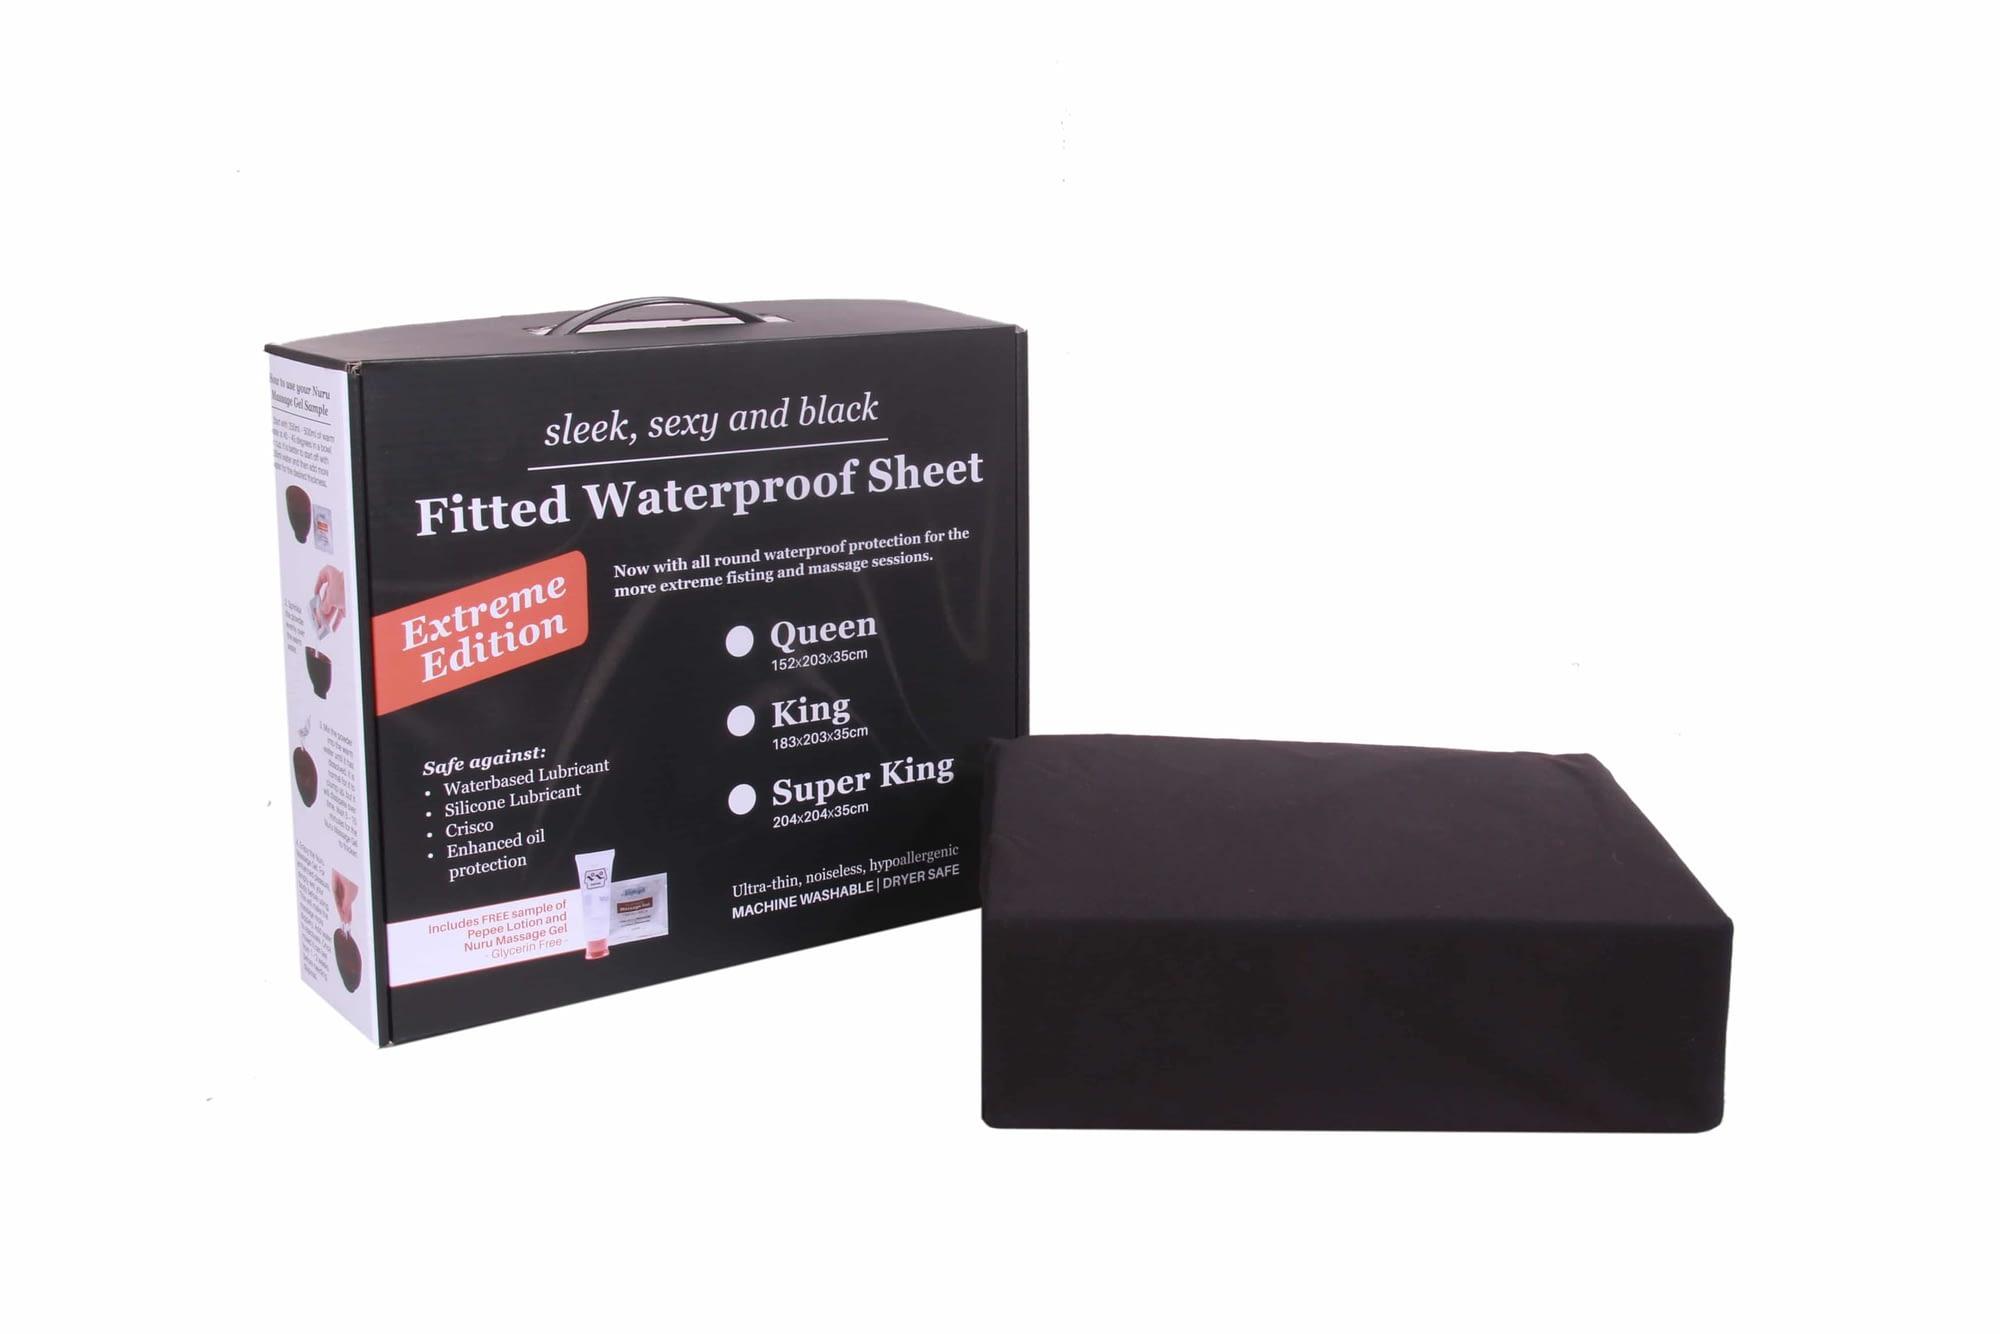 Eroticgel Australia Black Waterproof Bedding Extreme Edition Front